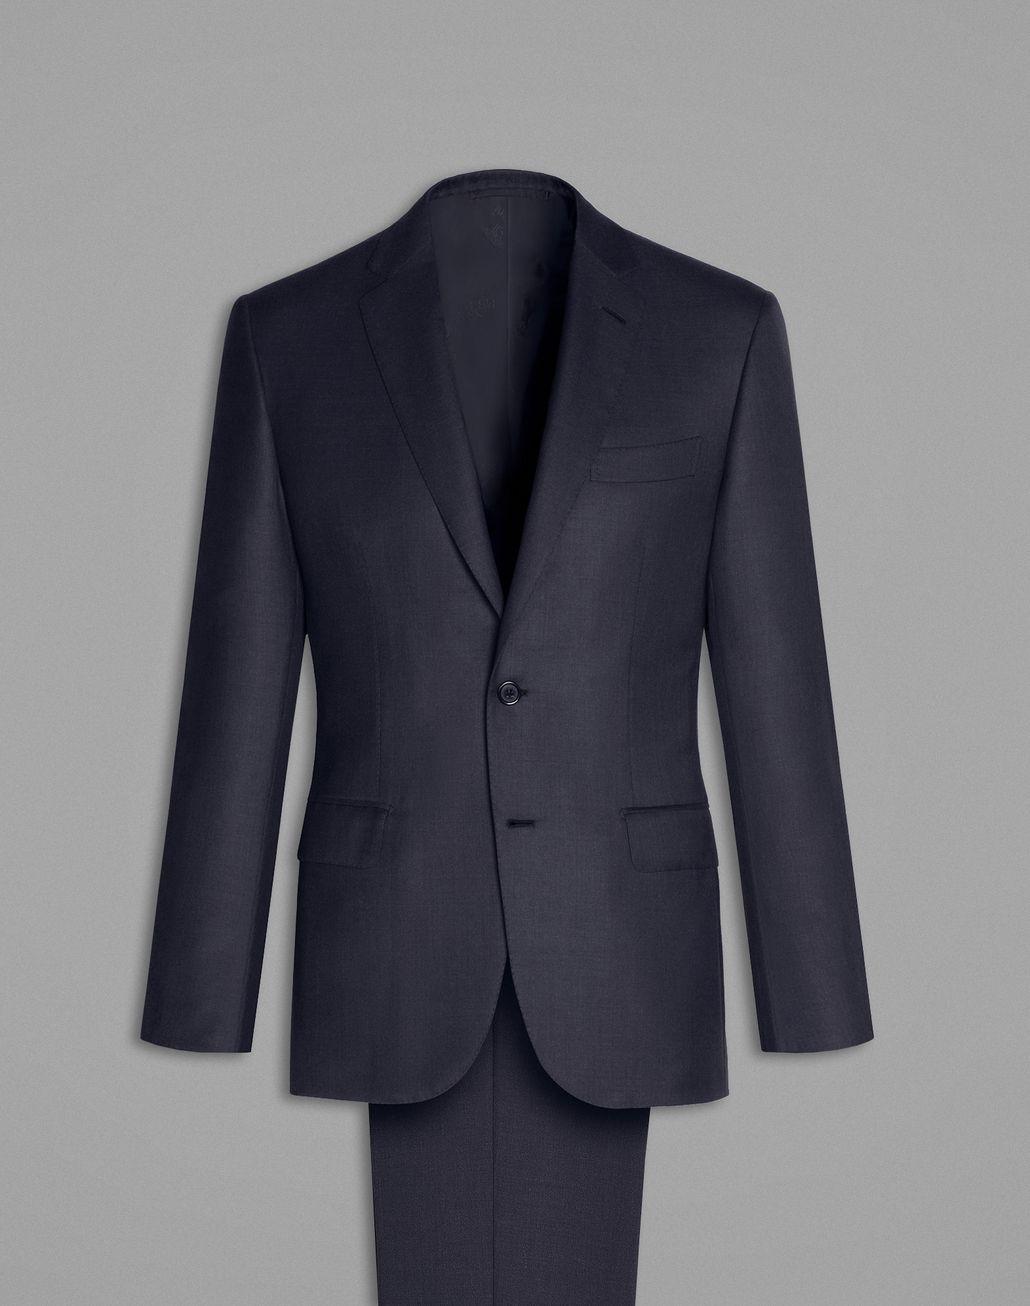 58aa8ebc02b5 BRIONI 'Essential' Navy Blue Madison Suit Suits & Jackets ...